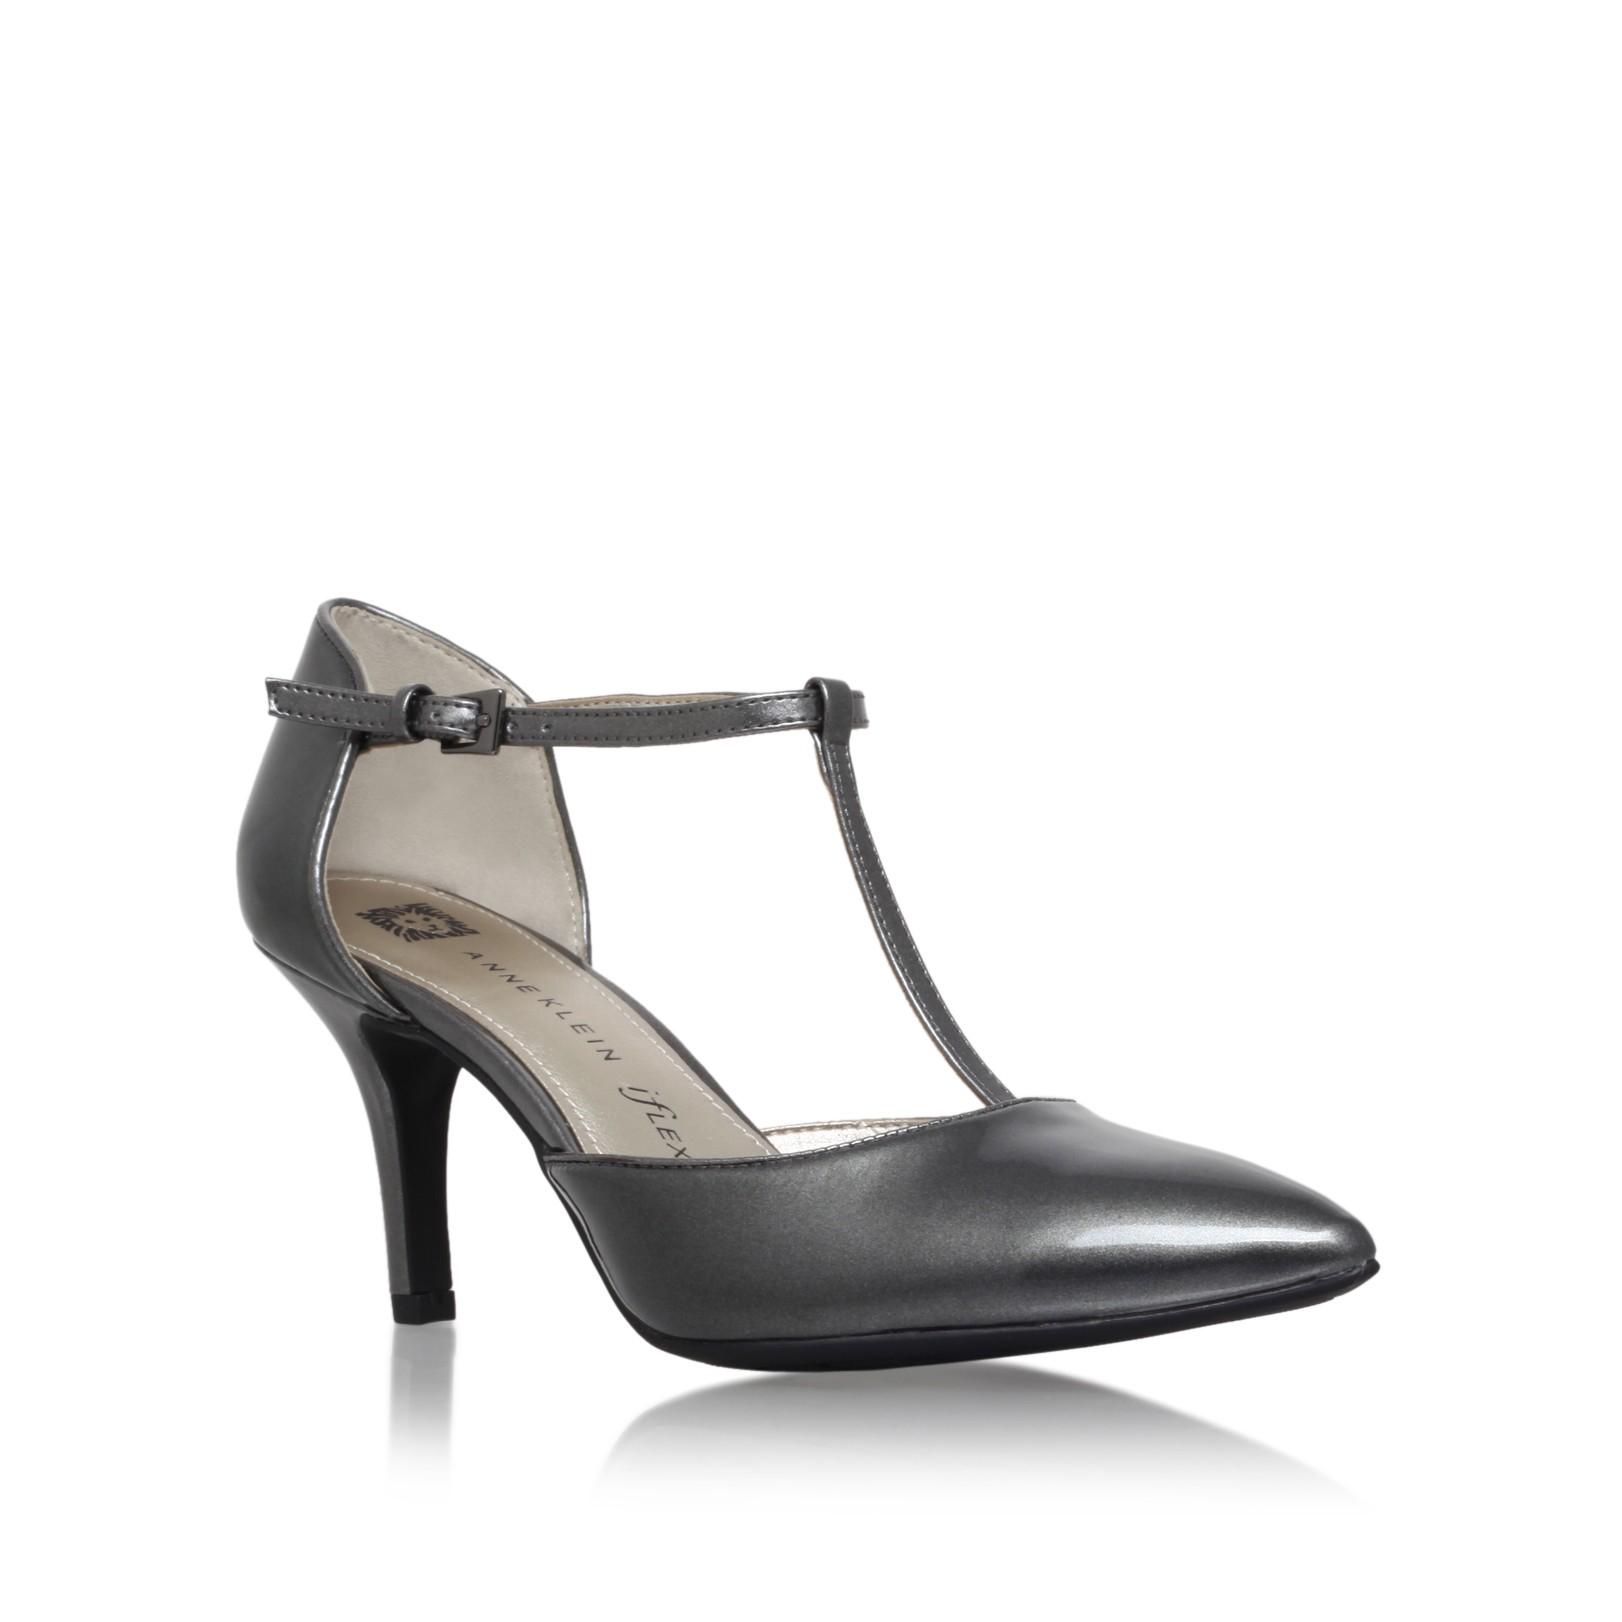 aab67a91e51 Anne Klein Yatima T Strap Sandals in Metallic - Lyst